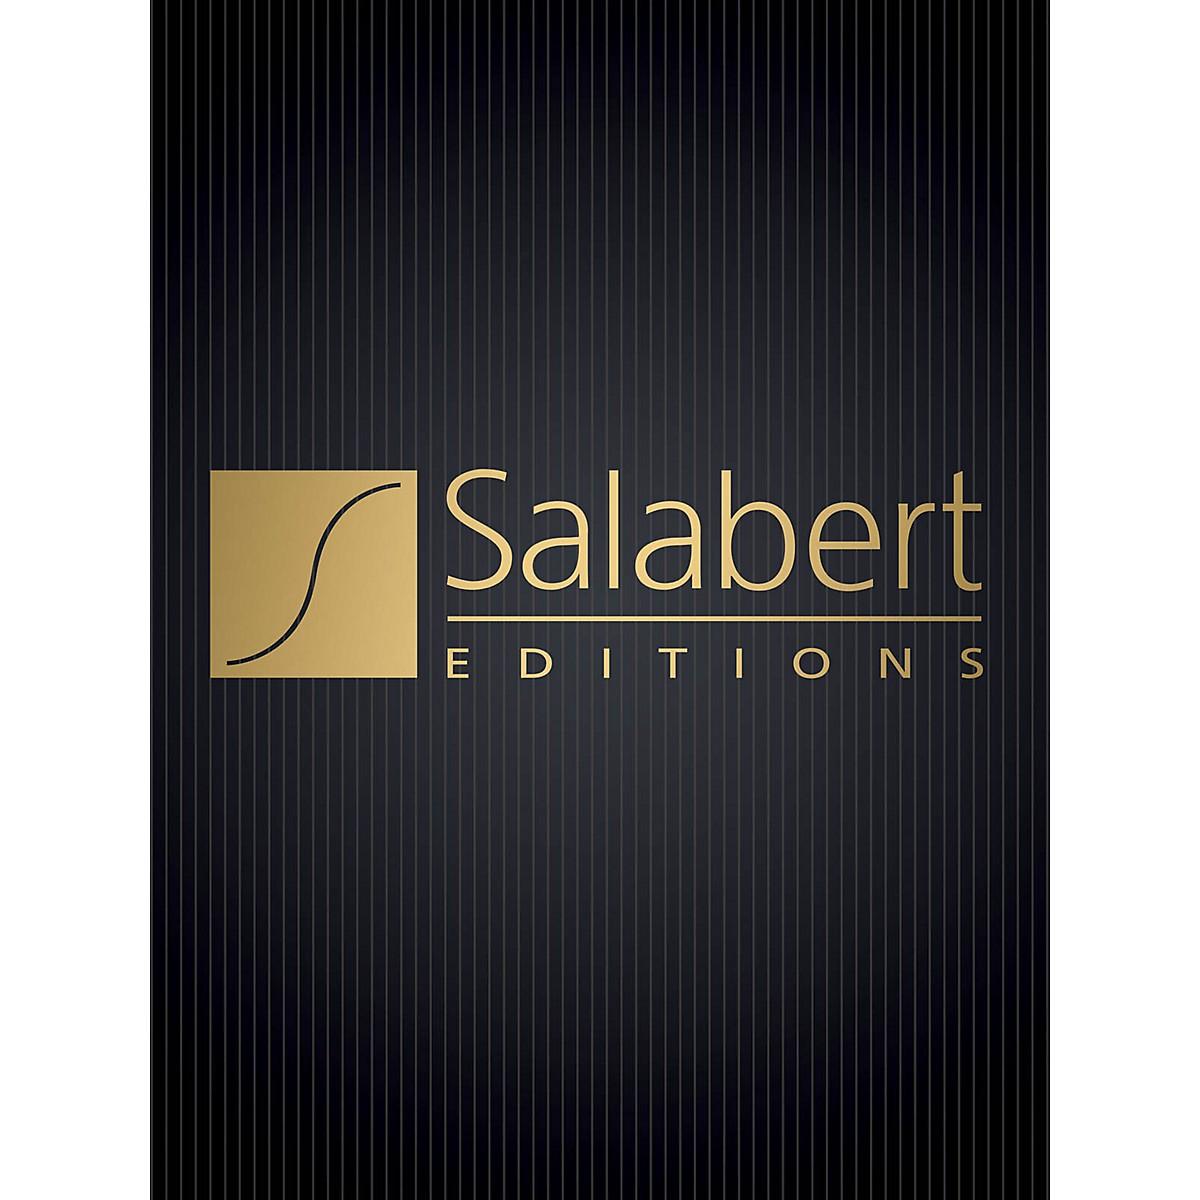 Editions Salabert Cancion y Danza No. 6 (Guitar Solo) Guitar Solo Series Composed by Federico Mompou Edited by Alirio Diaz